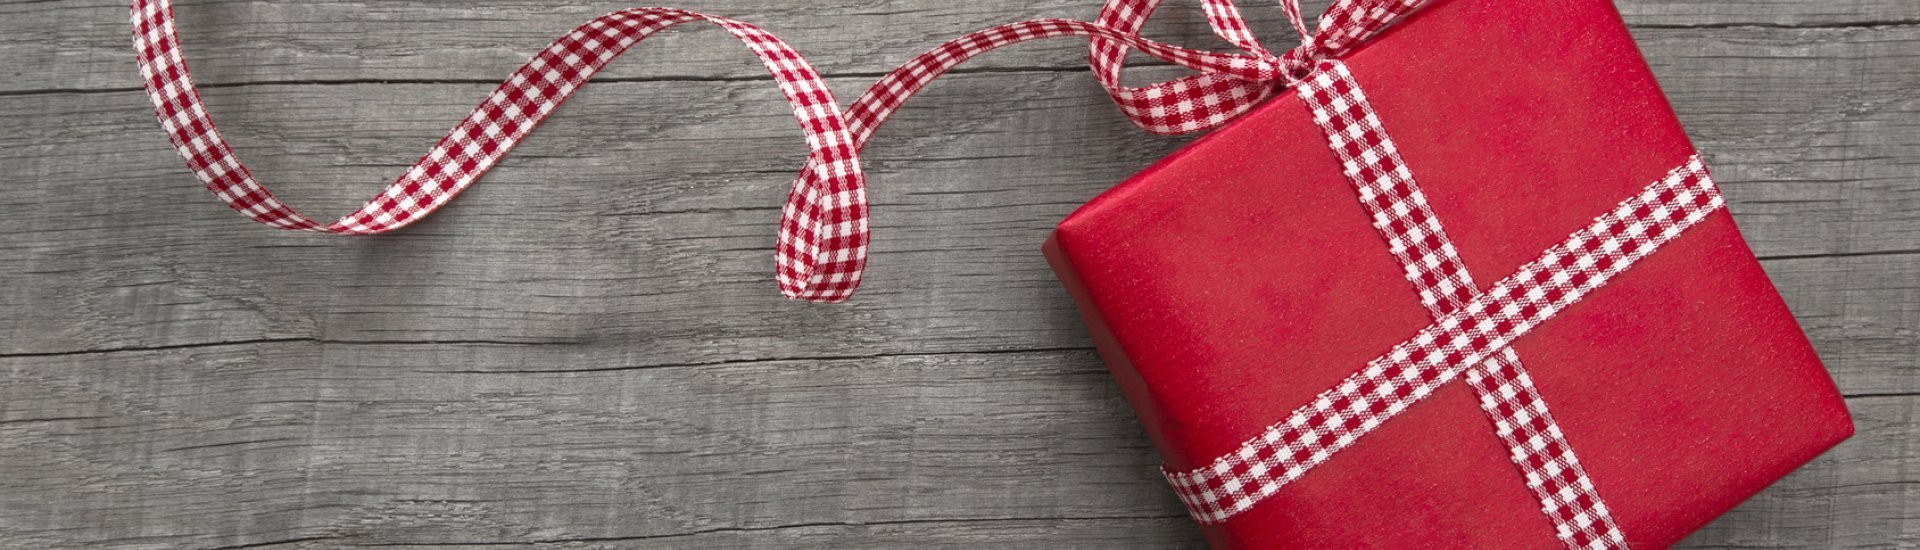 Voucher - Zrób prezent już dziś!